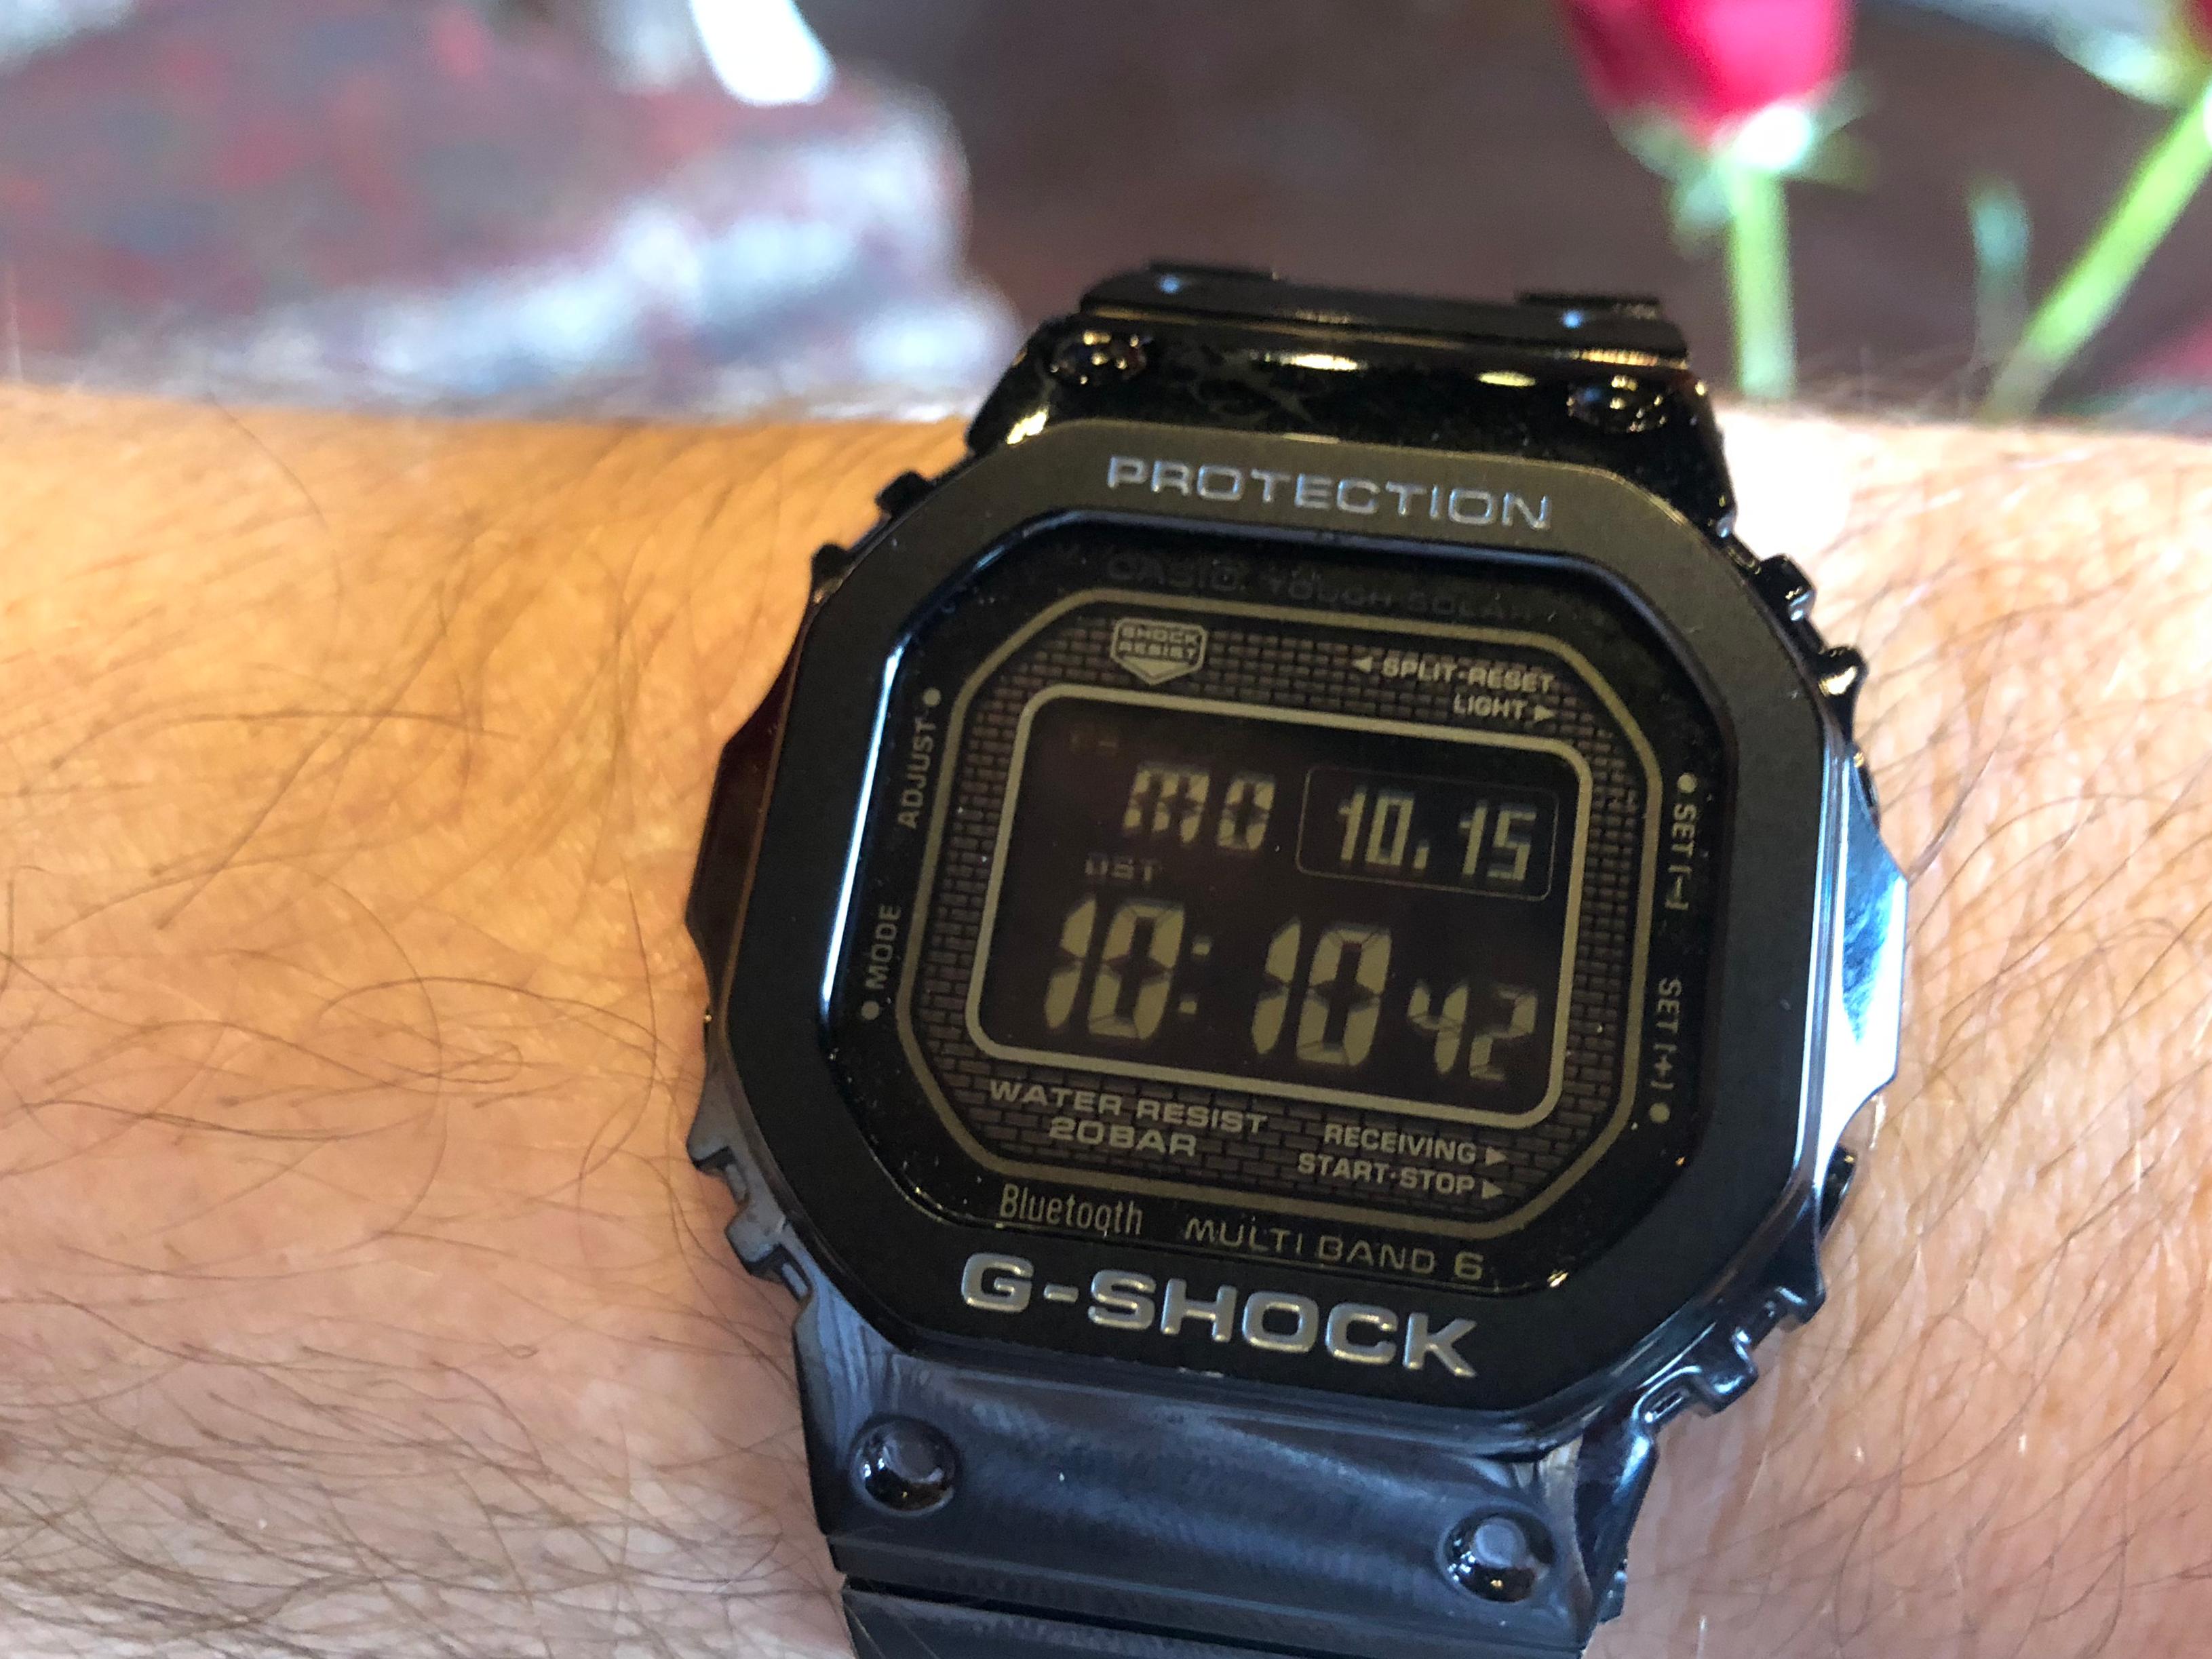 52f55d25ba52d Casio adds modern tech to the classic G-Shock watch